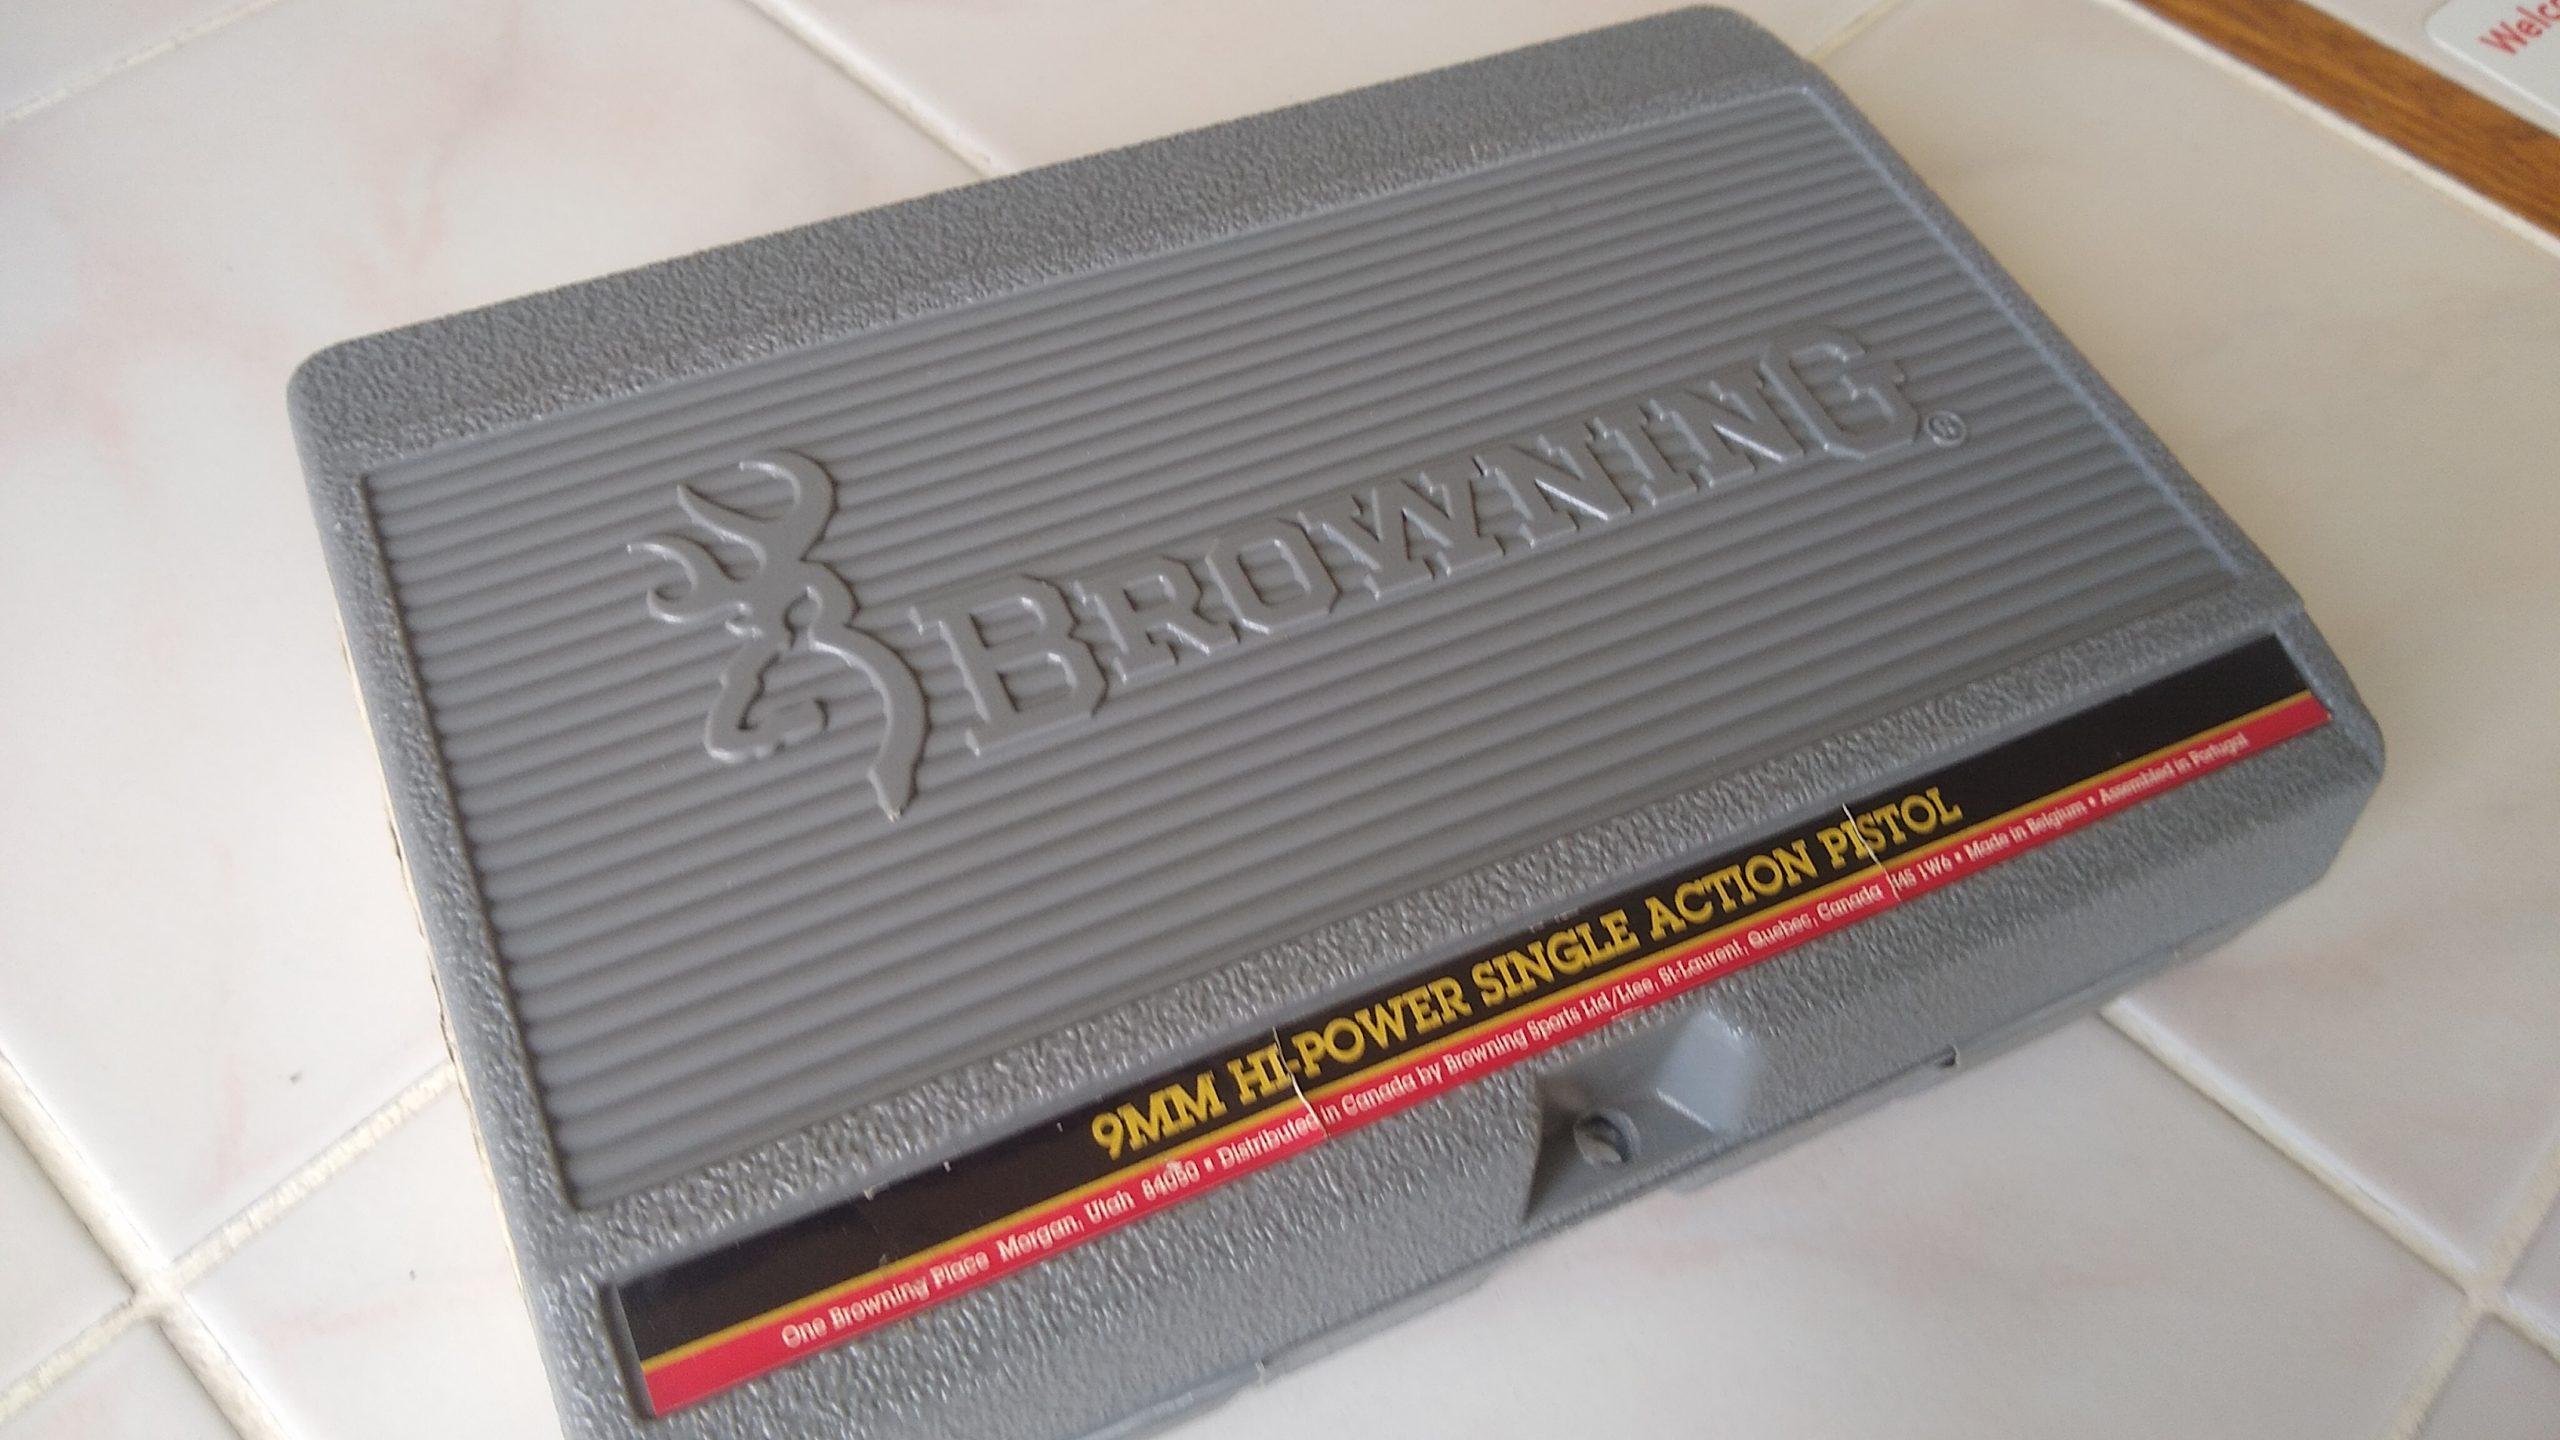 Browning pistol case